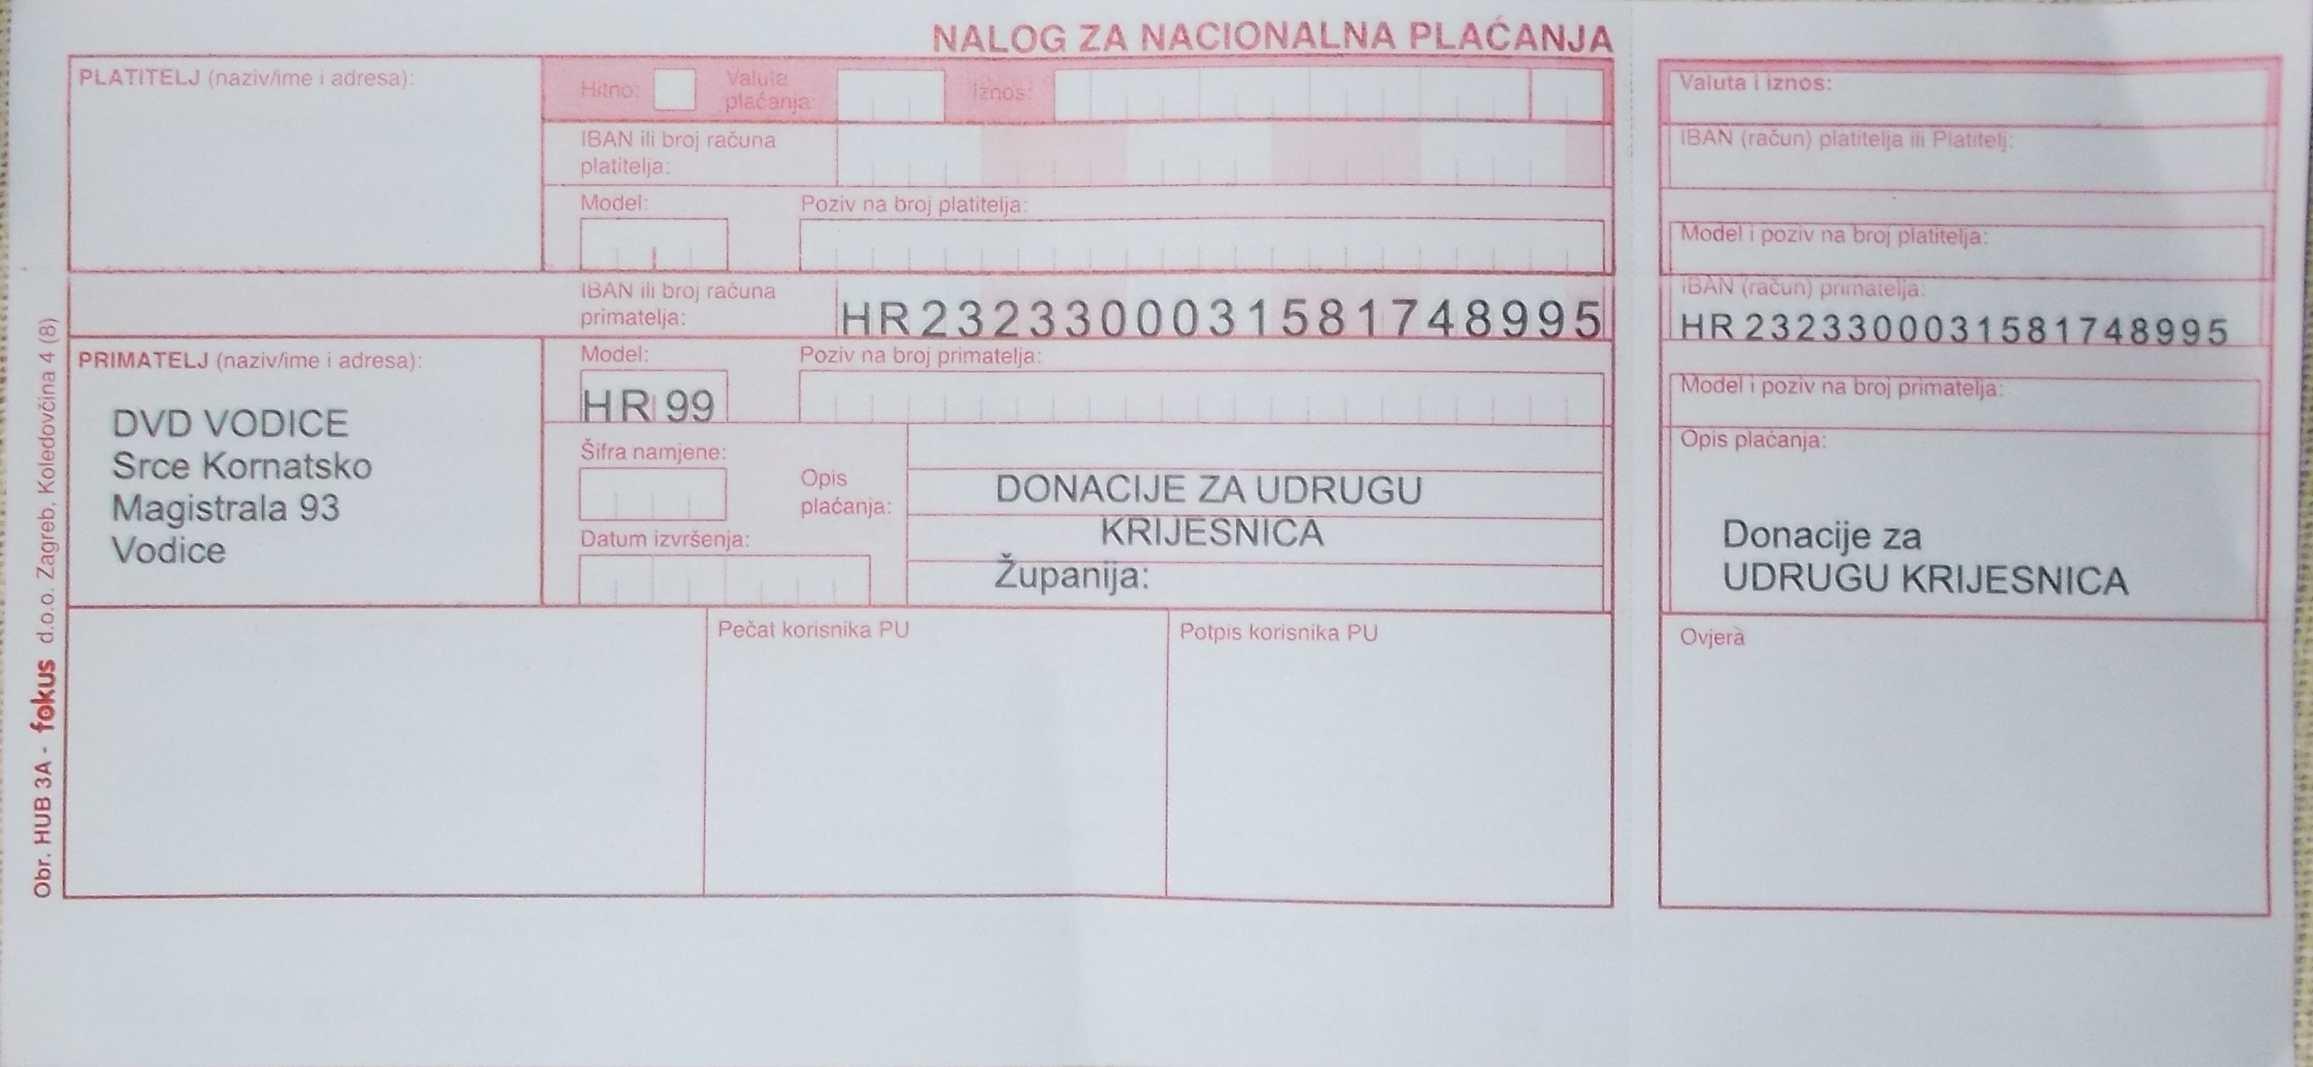 www.vatrogasni-portal.com/images/news/stjepan_maksimovic_dscn0112_nalog_za_nacionalna_placanja.jpg